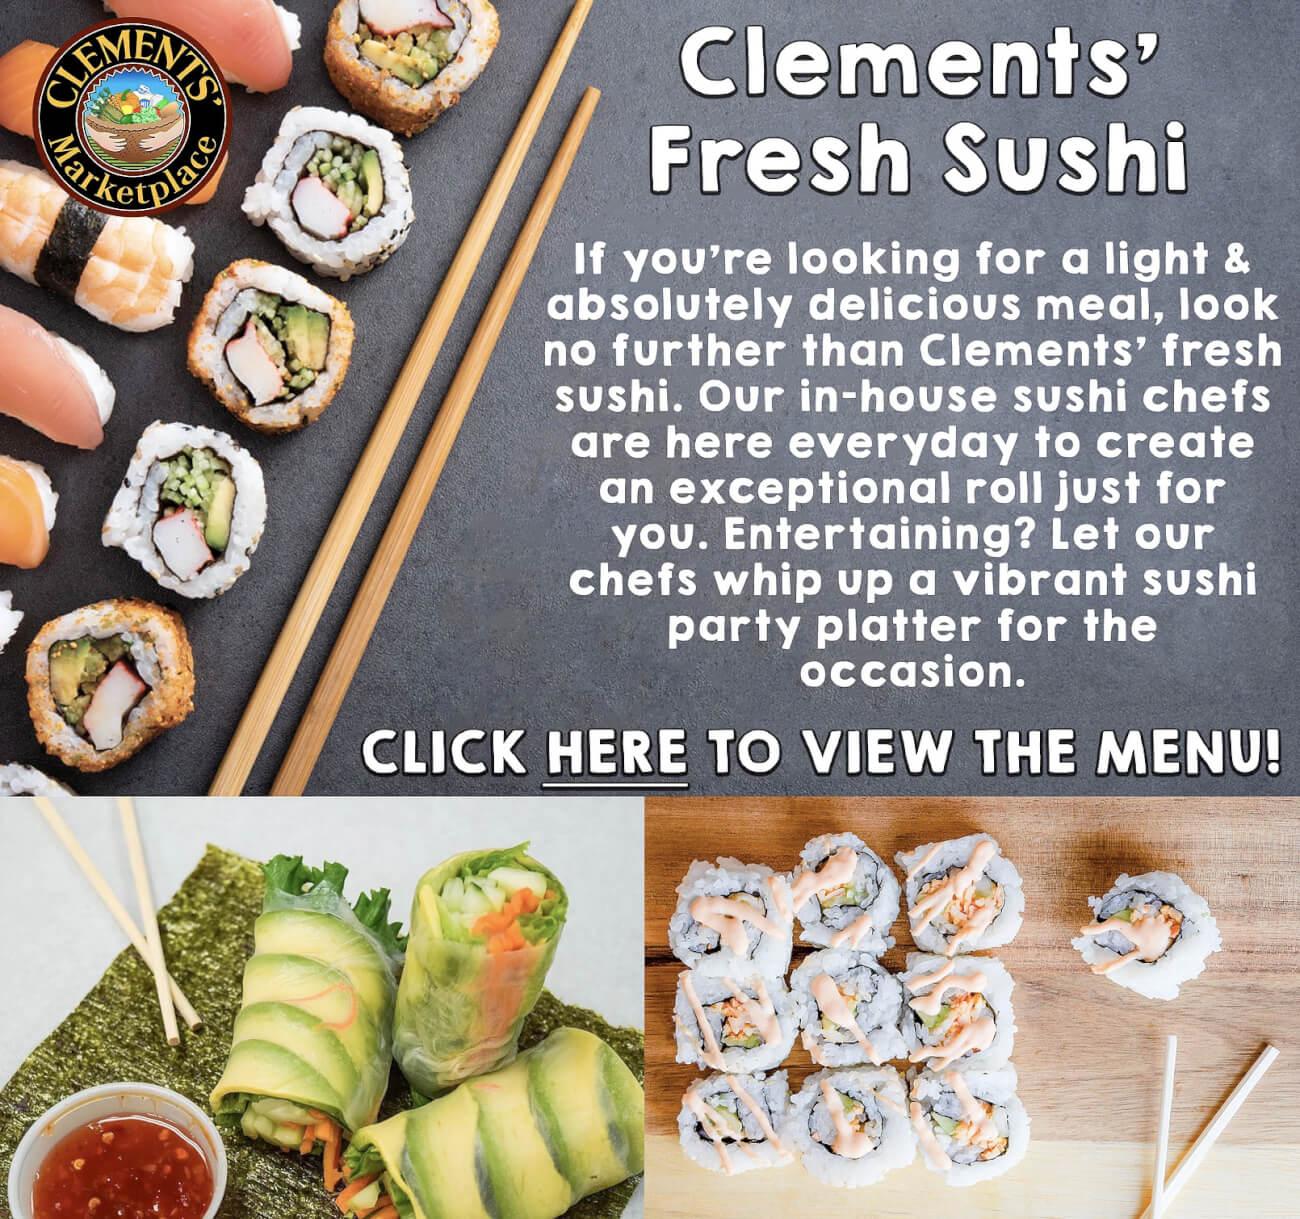 Clements Fresh Sushi